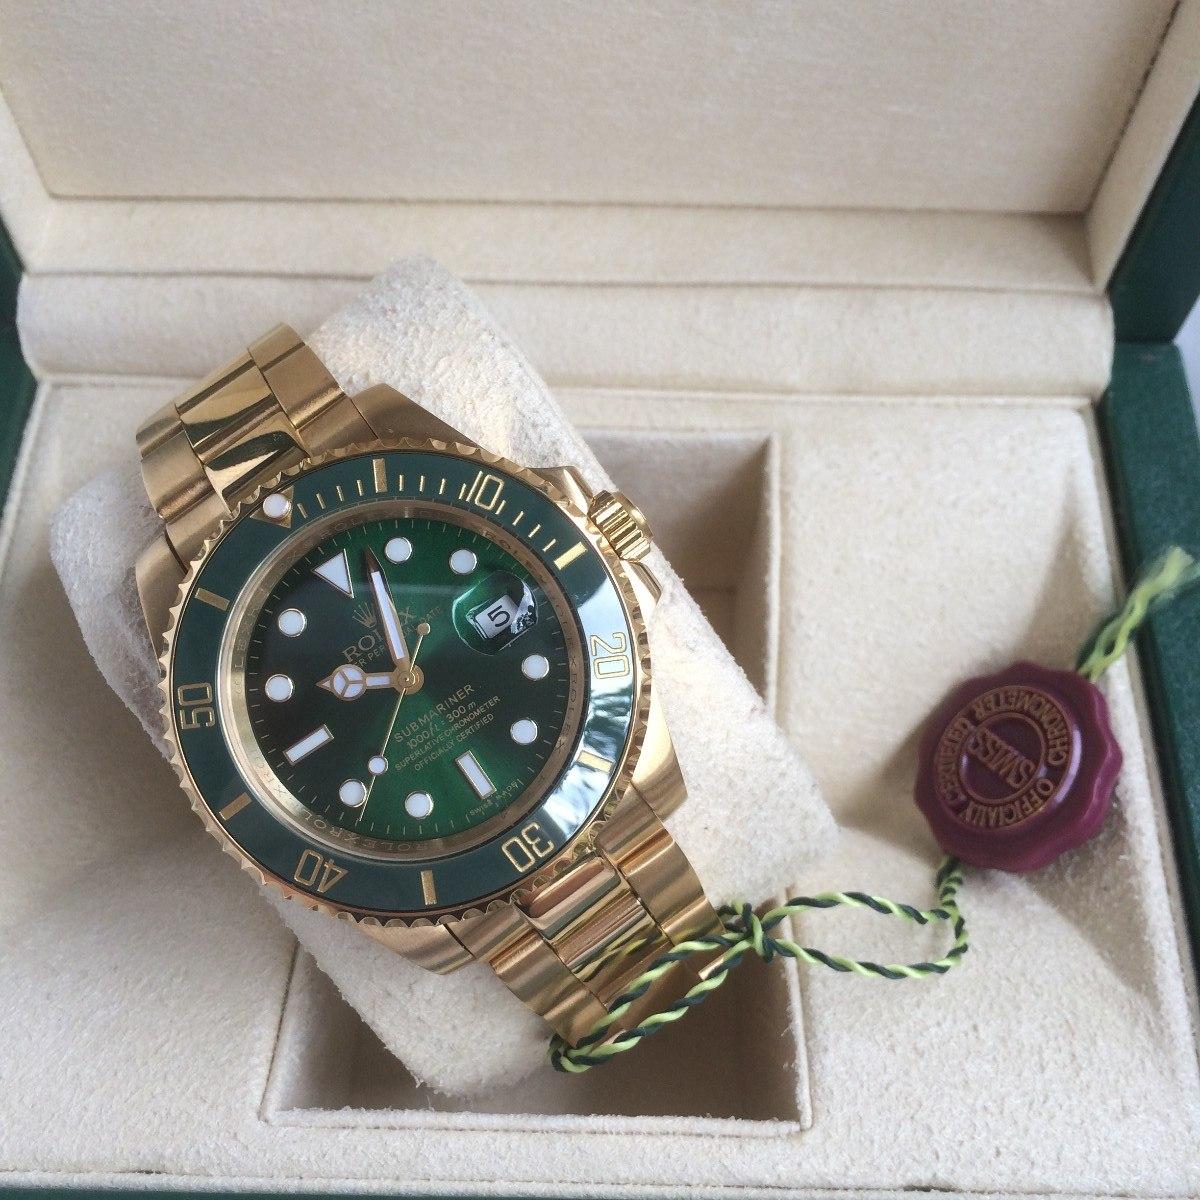 Automatico Rolex Eta Reloj Submariner Oro w8vmn0N